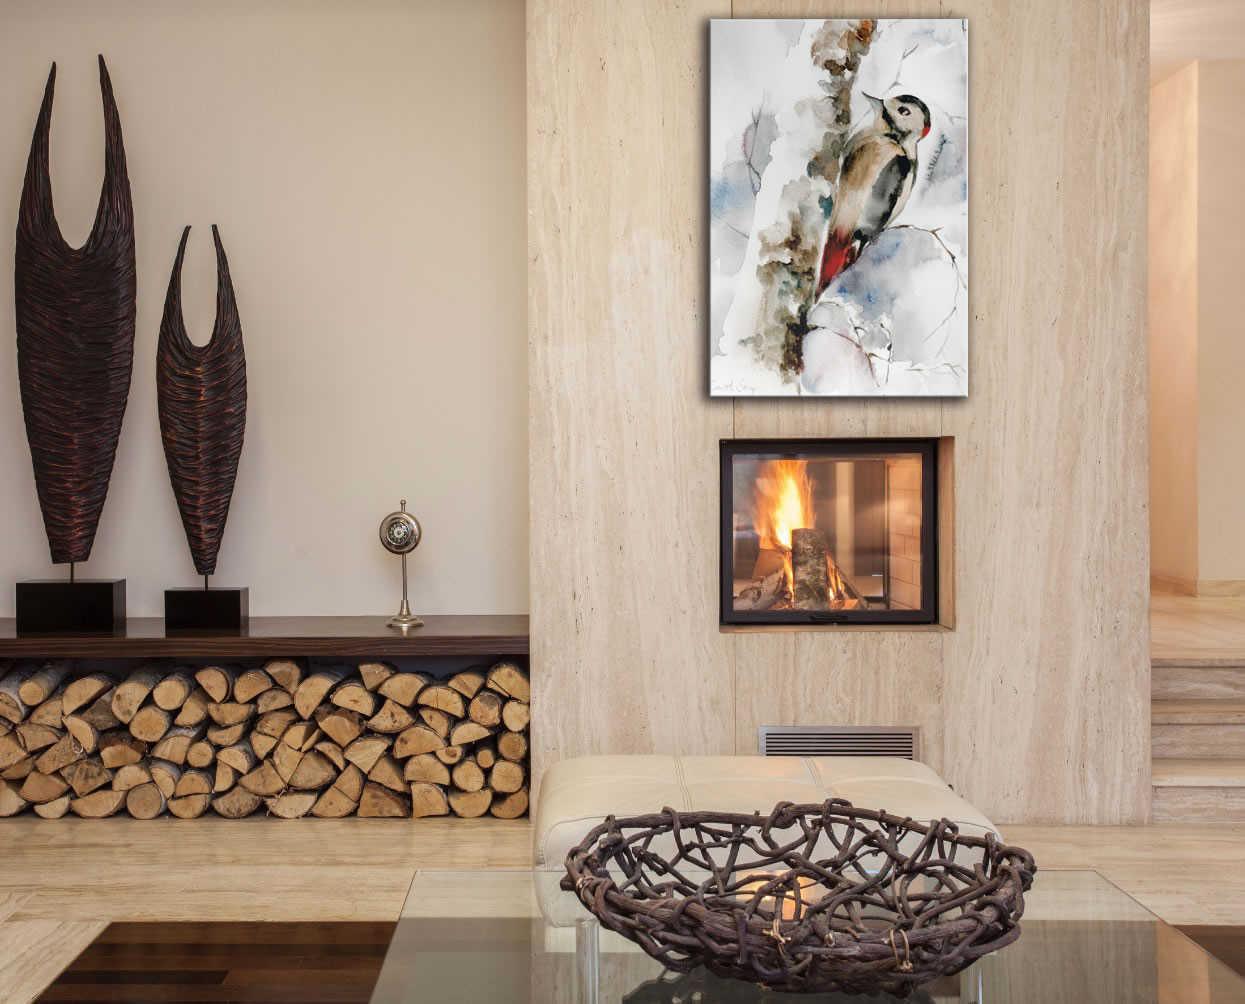 Woodpecker - Modern Metal Wall Art - Lifestyle Image